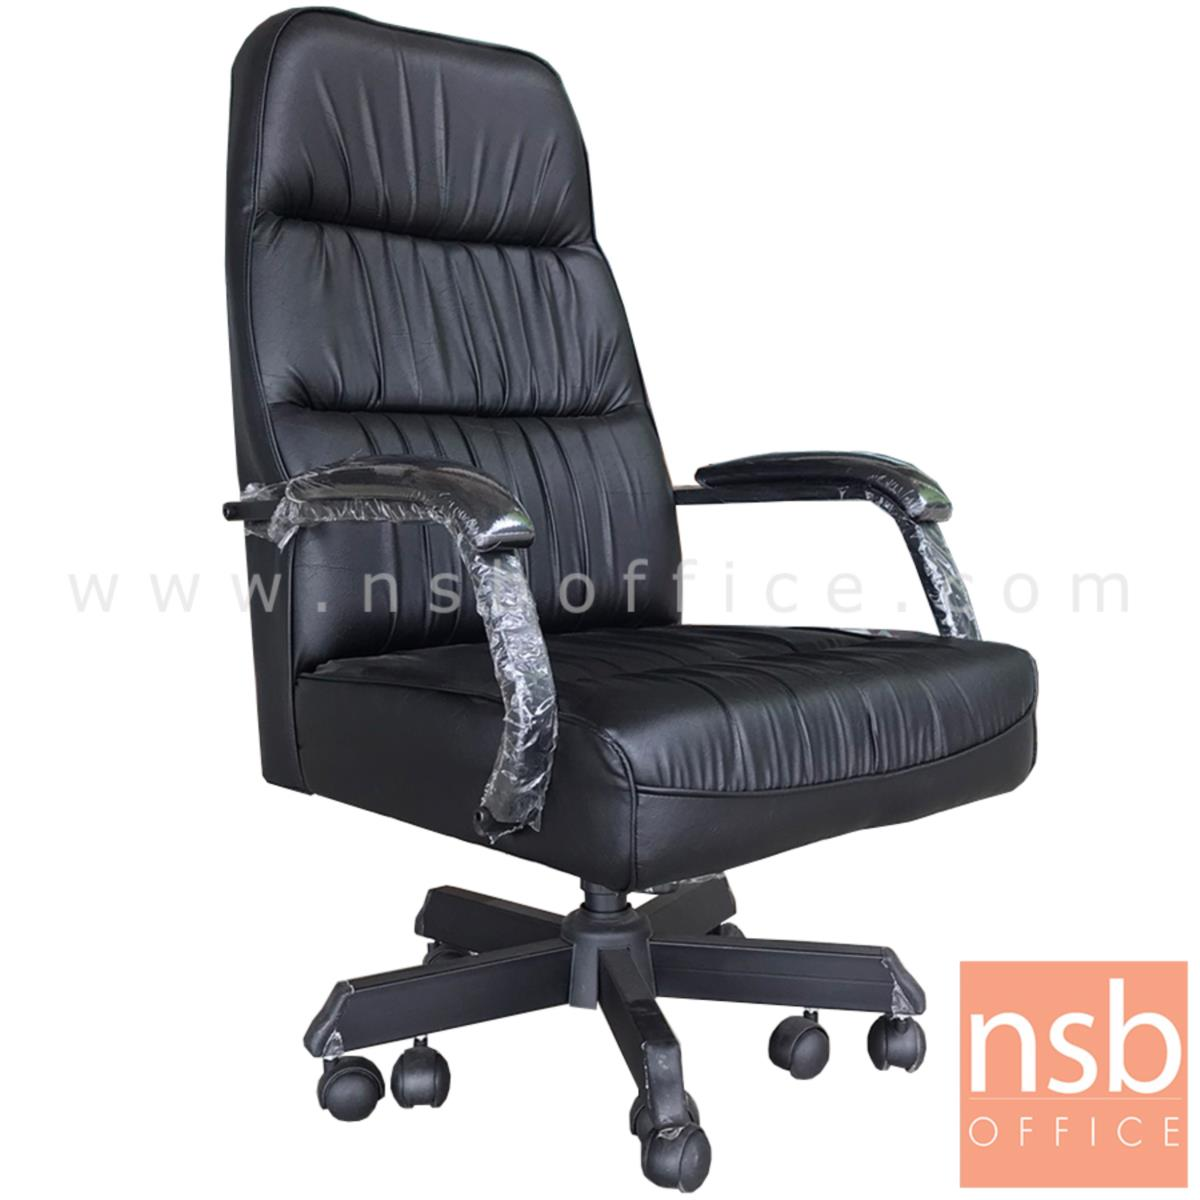 B01A145:เก้าอี้สำนักงาน รุ่น Wheeler (วีลเลอร์)  มีก้อนโยก ขาเหล็ก 10 ล้อ